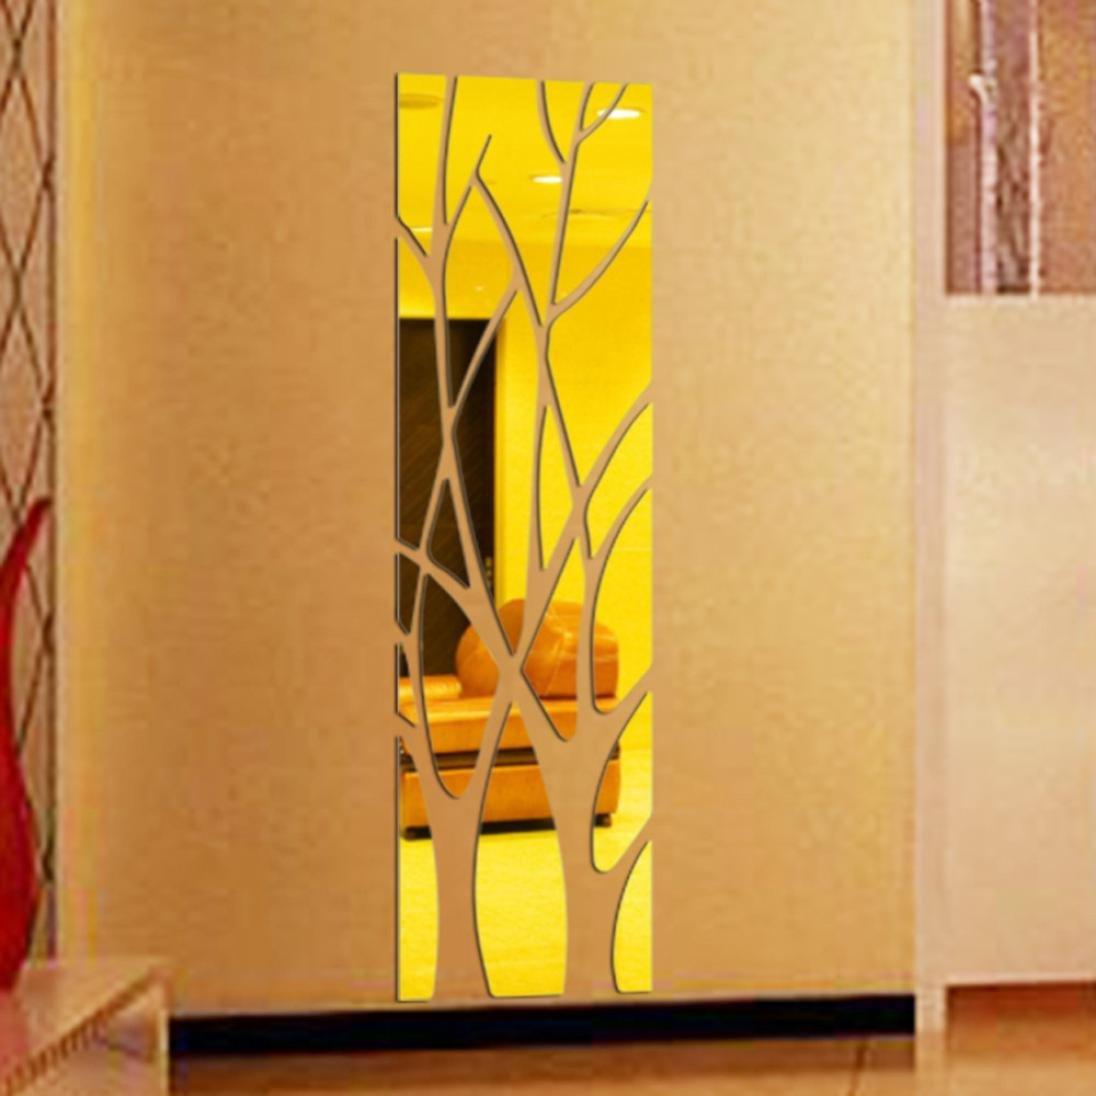 Snowfoller Tree Branch Mirror Art Mural Removable Self Adhesive ...